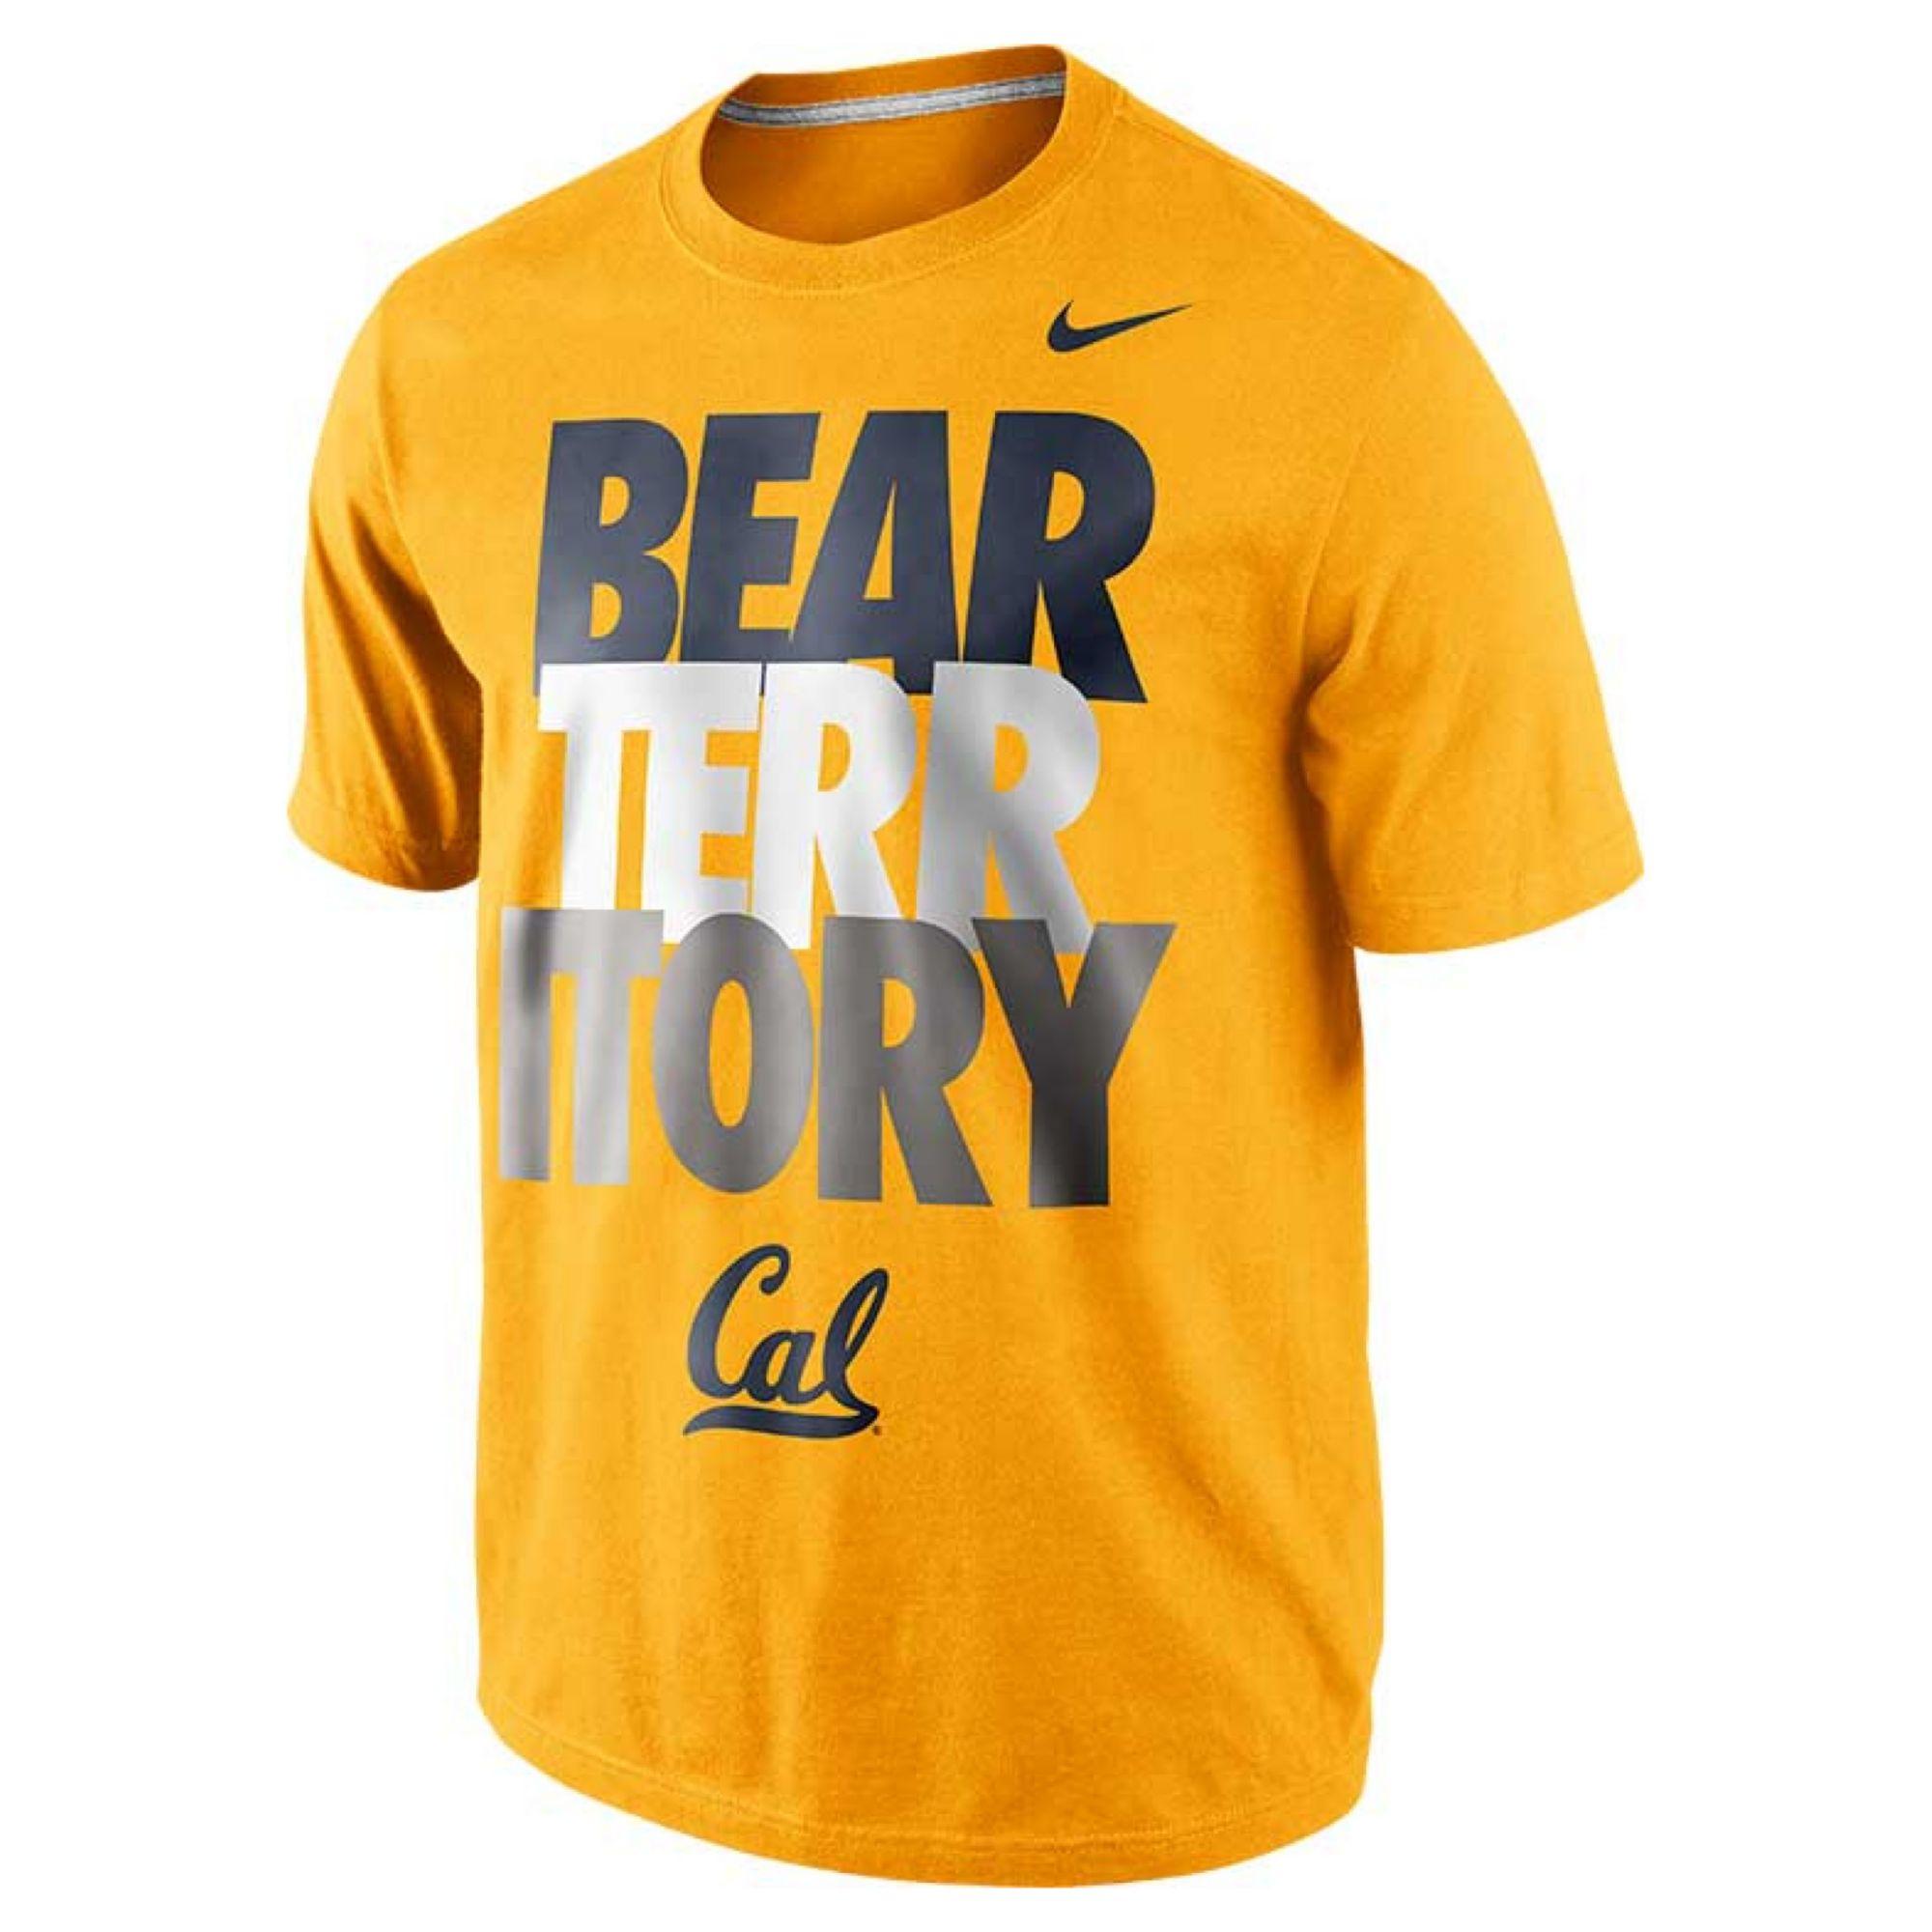 554ccf41e0b5c Nike Mens Shortsleeve California Golden Bears Tshirt in Yellow for ...